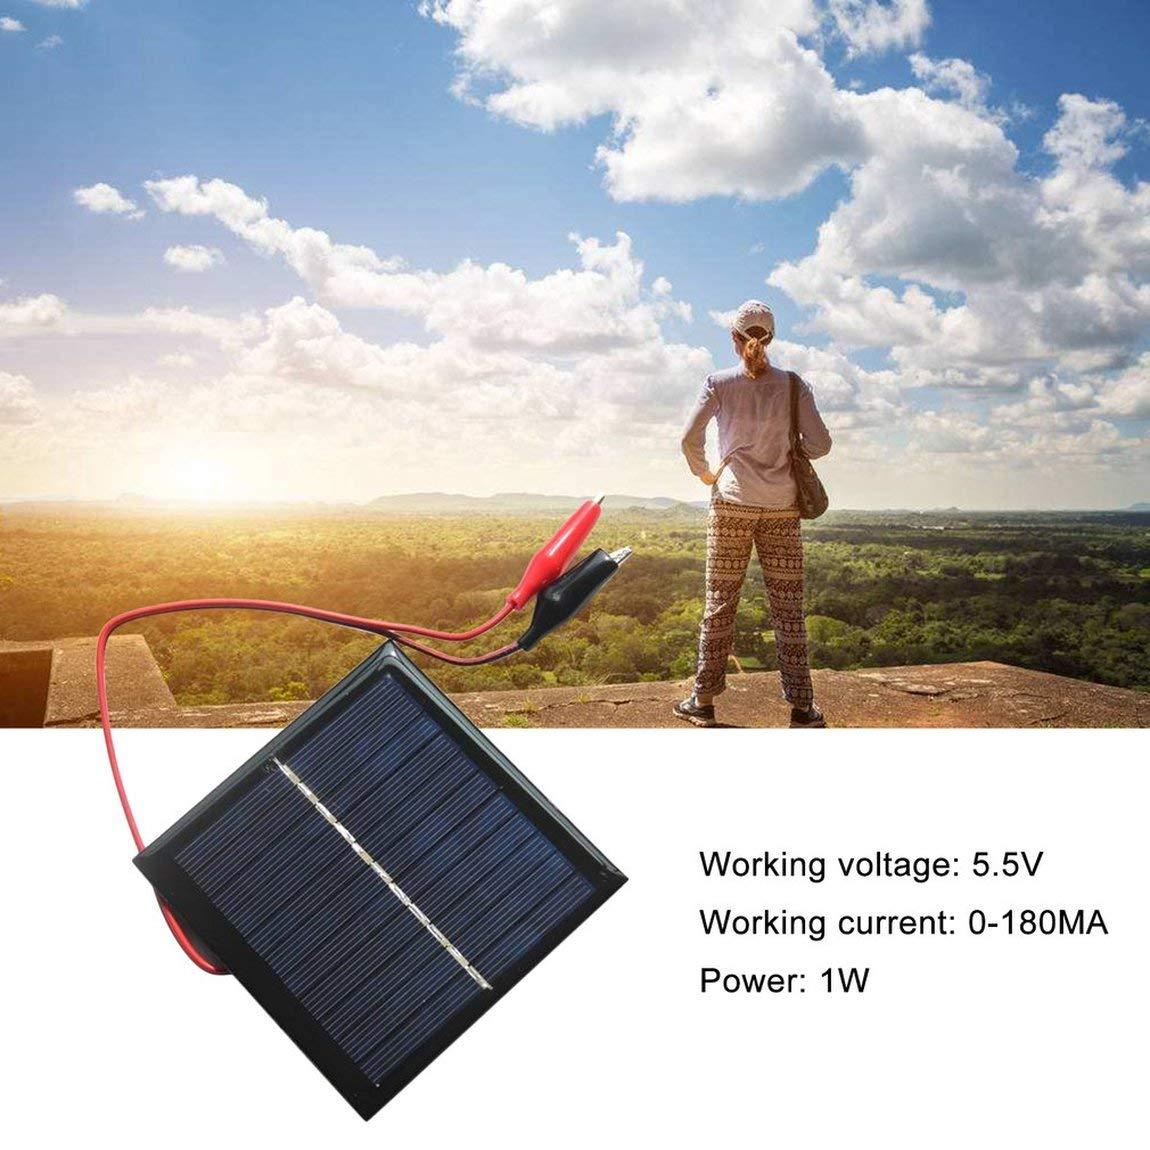 73JohnPol 1W 5.5V Tablero de Carga de Panel Solar de silicio policristalino Cargador de Bricolaje para Carga de bater/ía Recargable de 3.7V con Clip de Tigre y Color: Negro